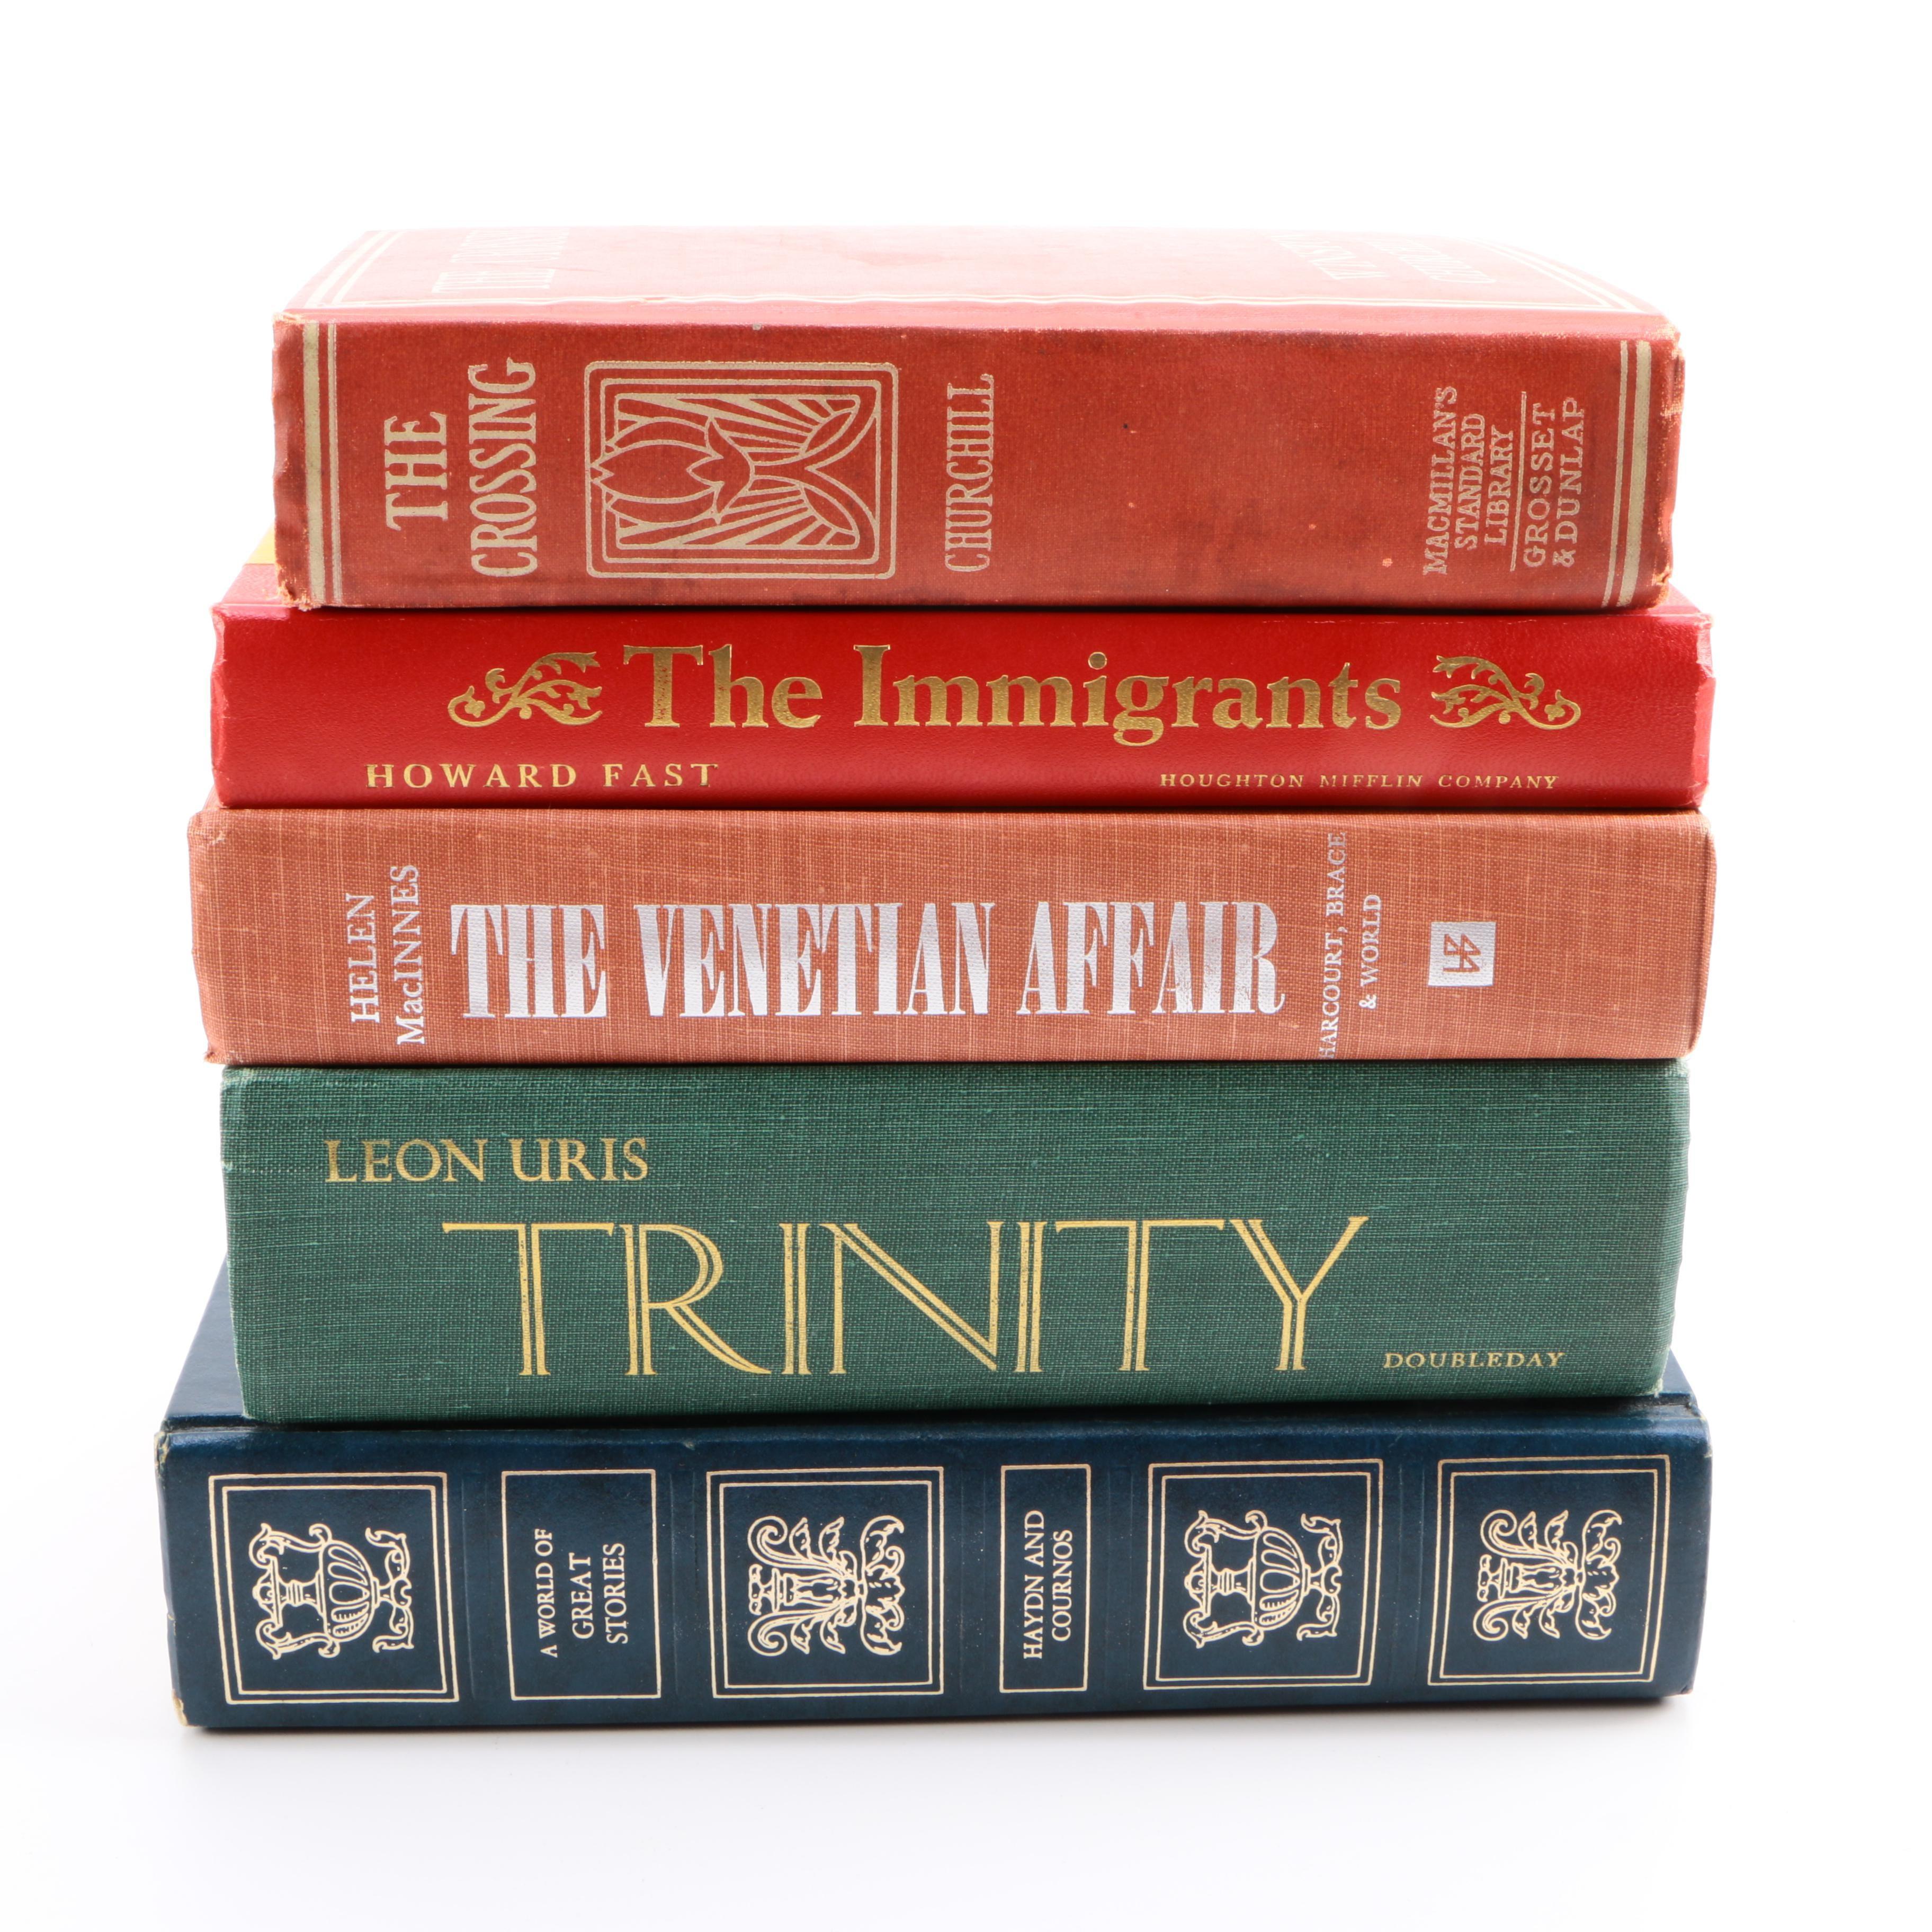 Assortment of Fiction Books